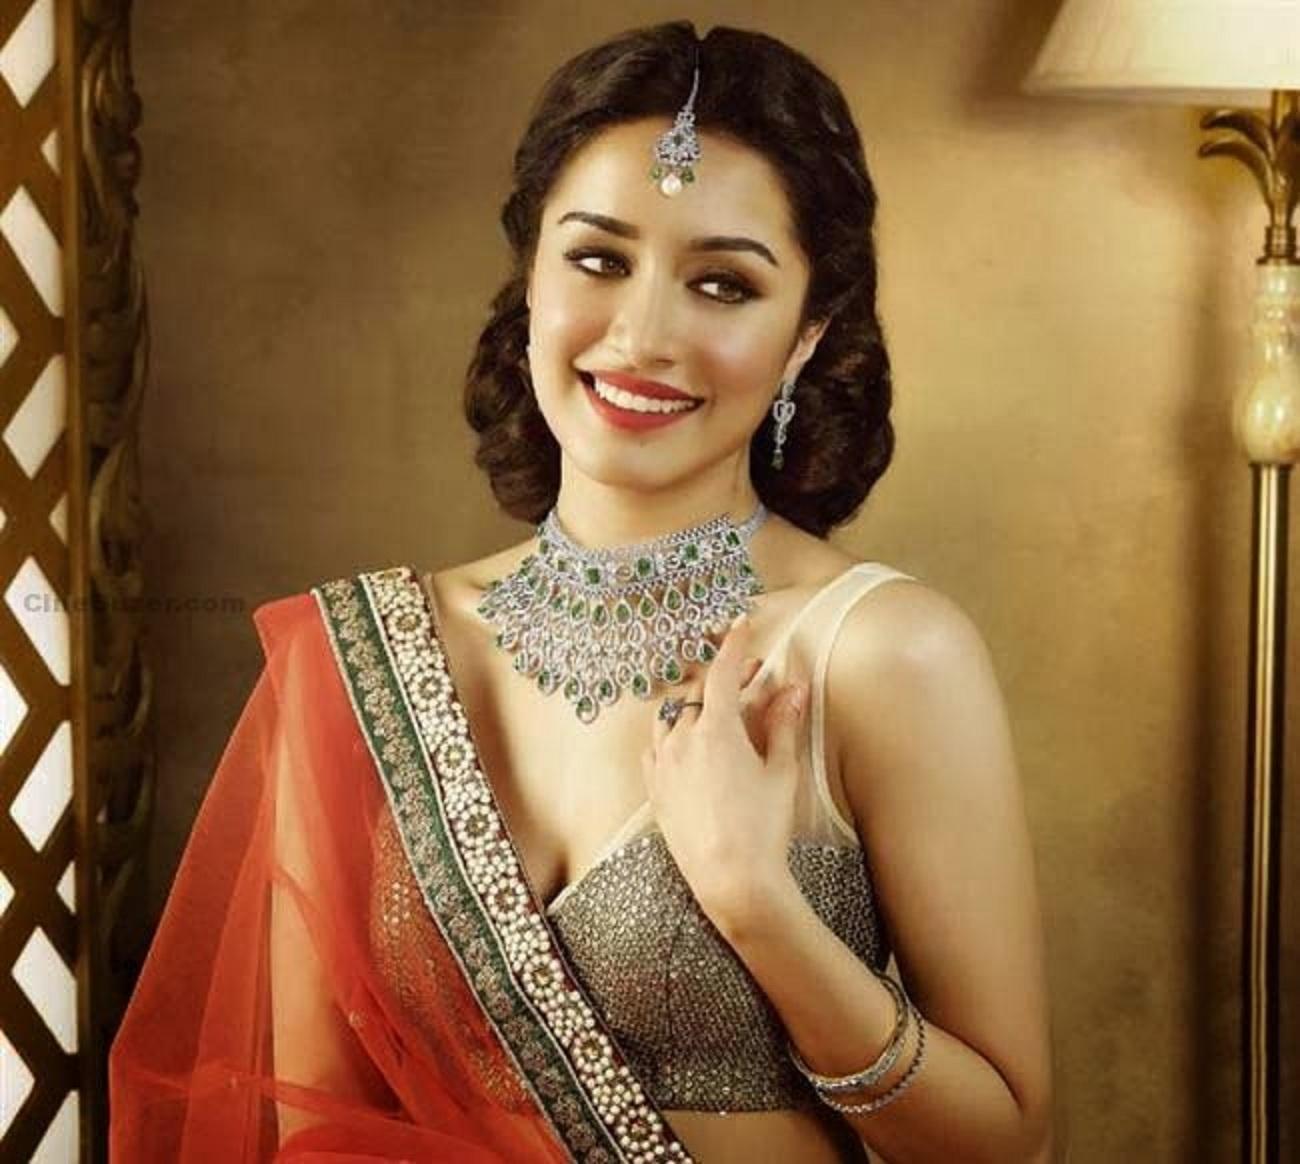 Shraddha Kapoor 4K Wallpaper | HD Wallpapers